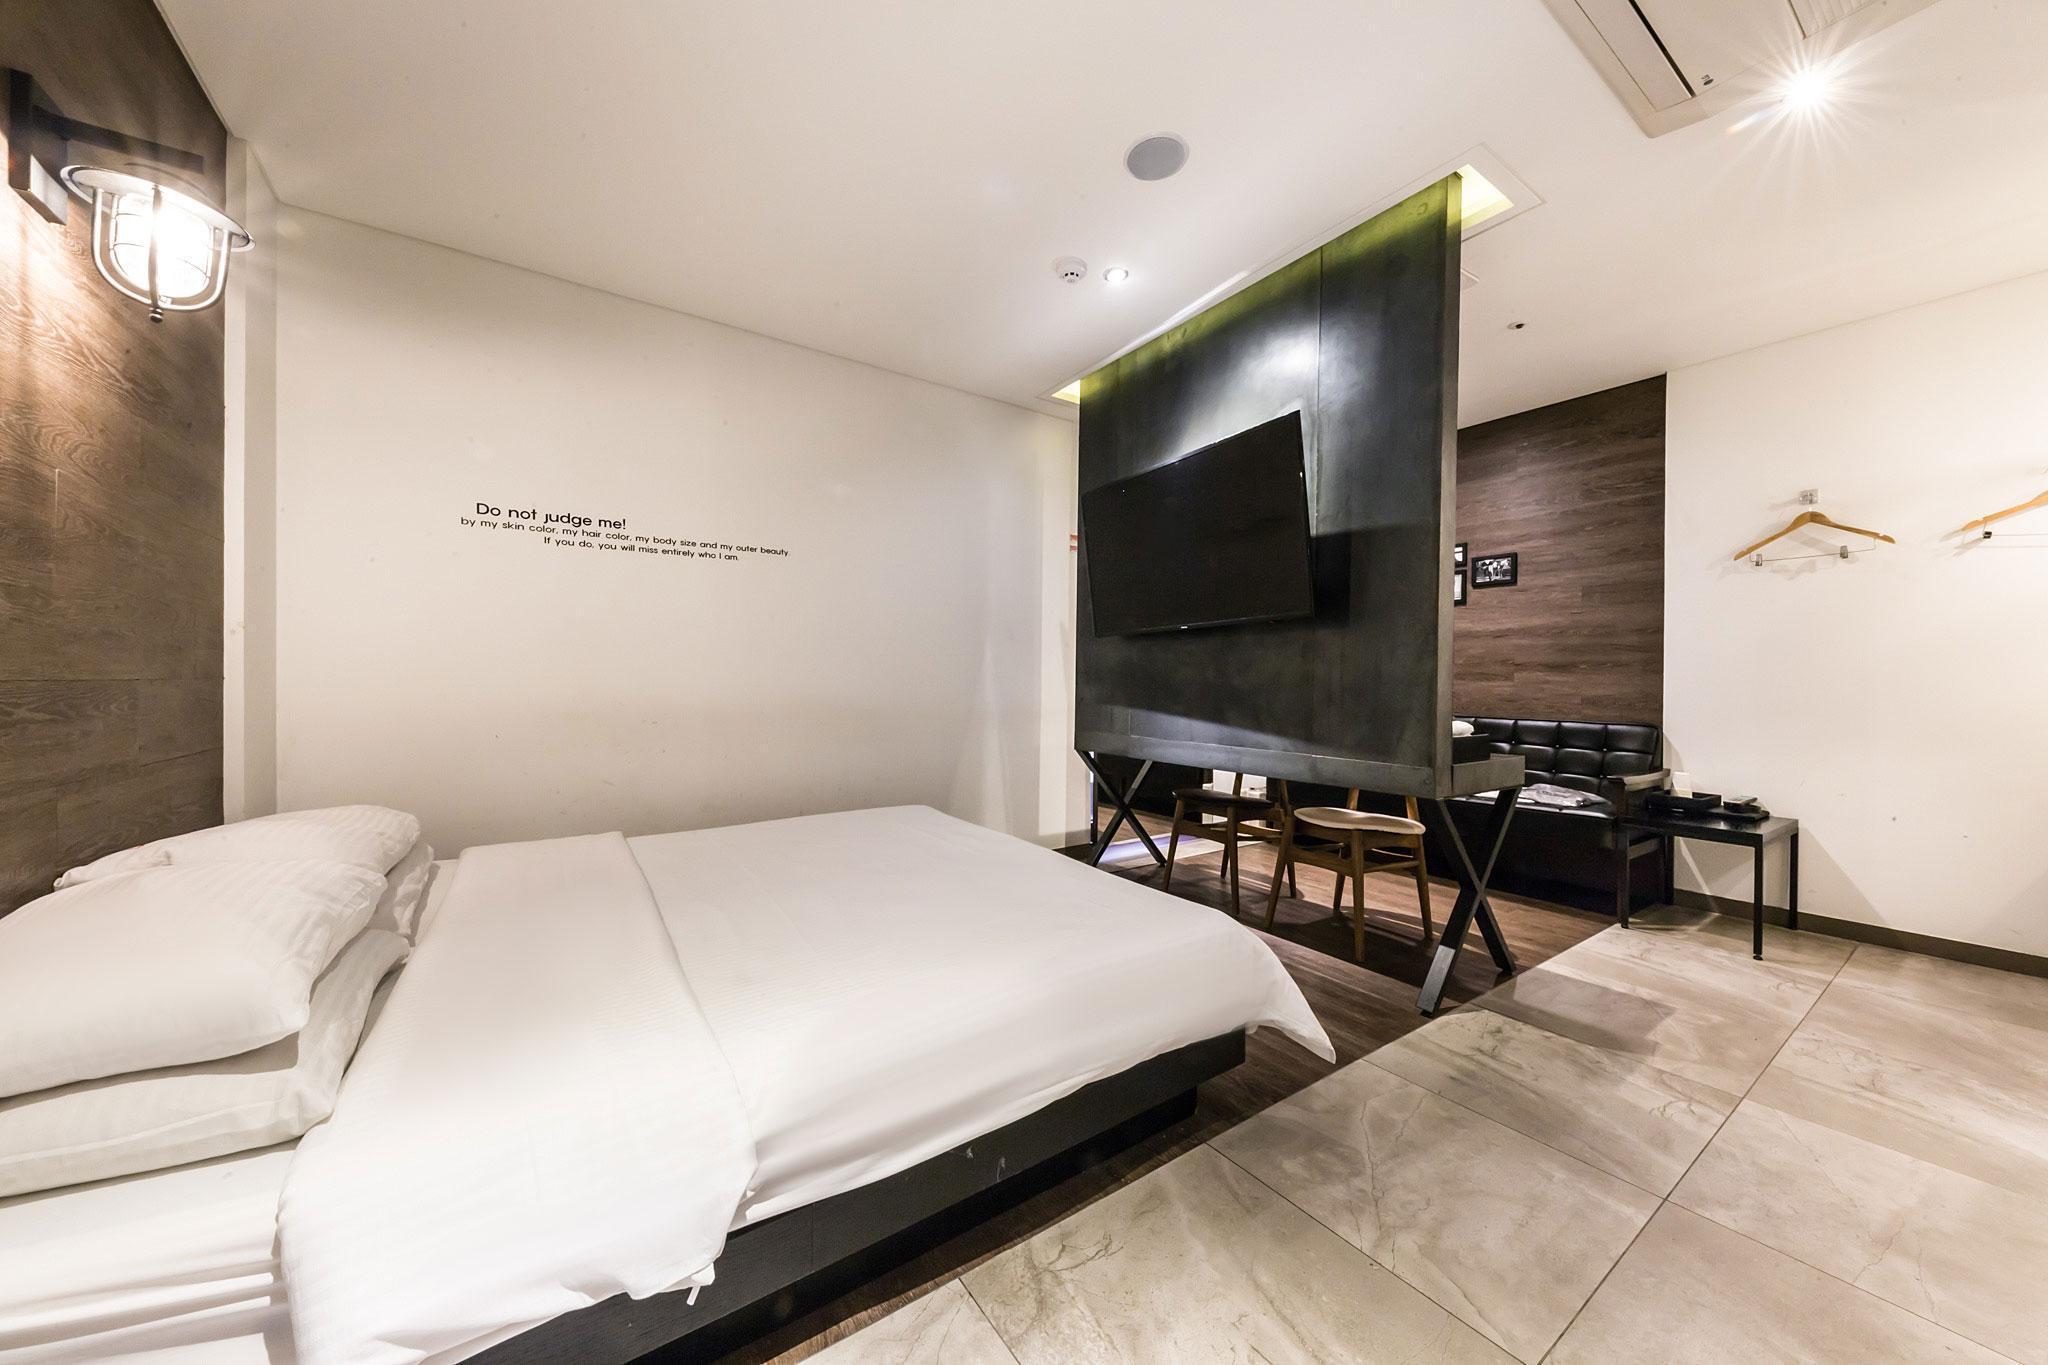 Hotel Hertz